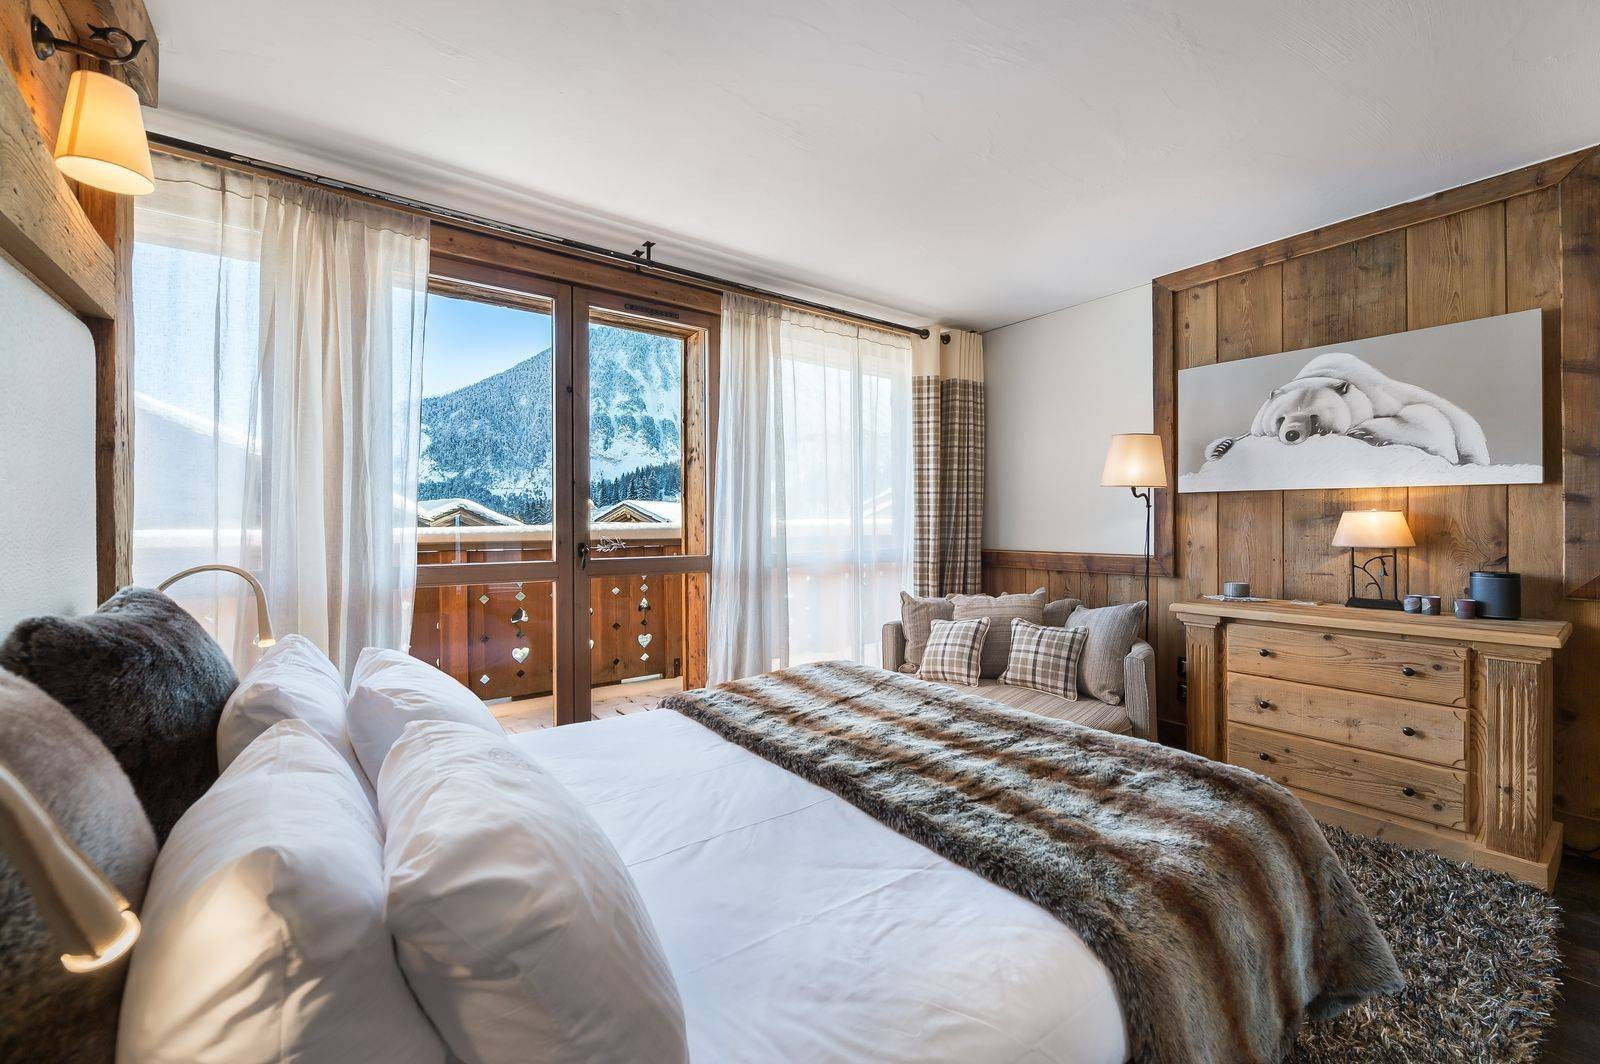 Courchevel 1550 Luxury Rental Chalet Niobite Bedroom 4